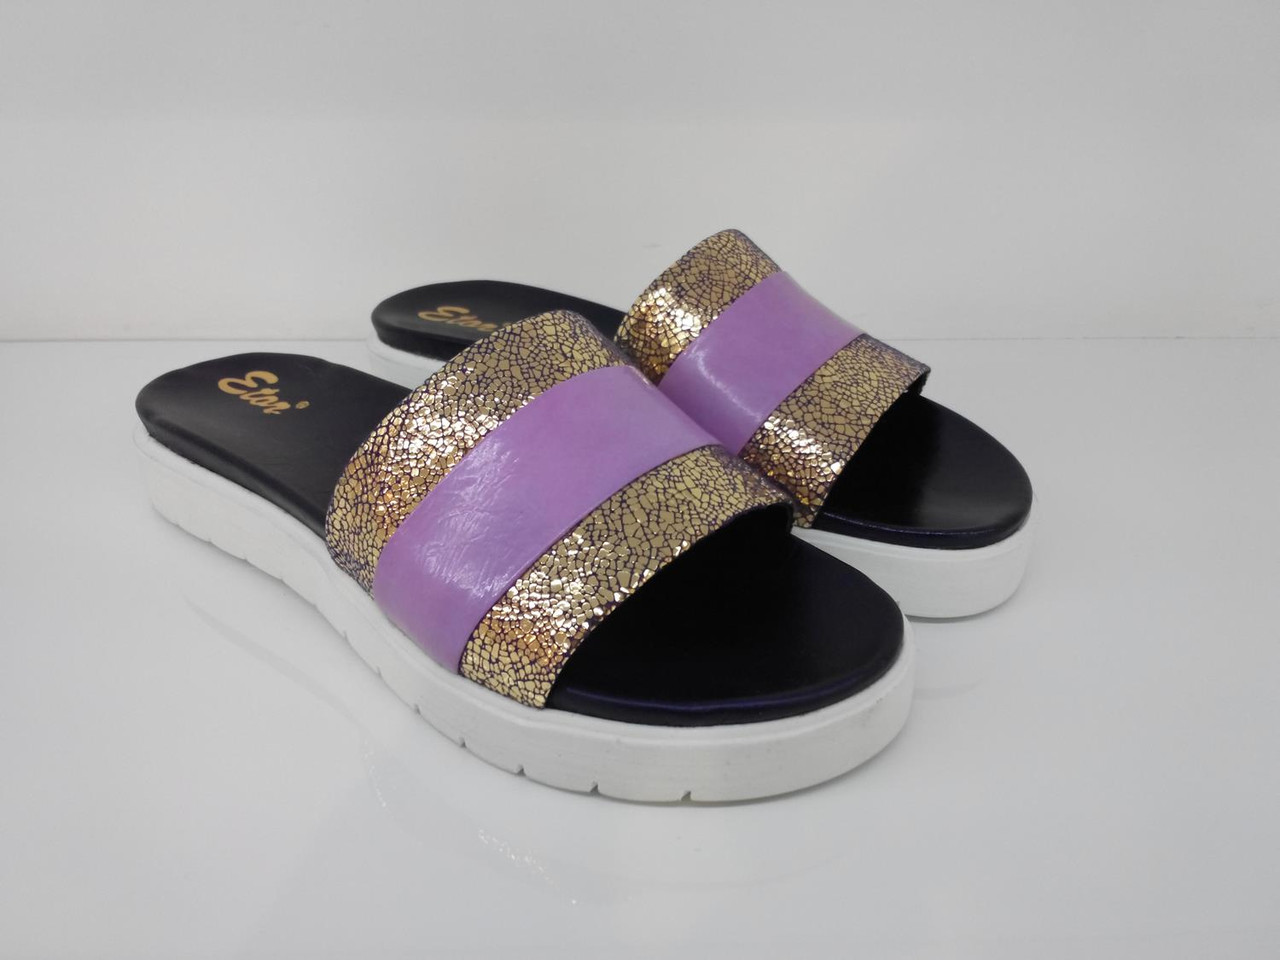 Шлепанцы Etor 5355-56153-12 фиолетовые, фото 1